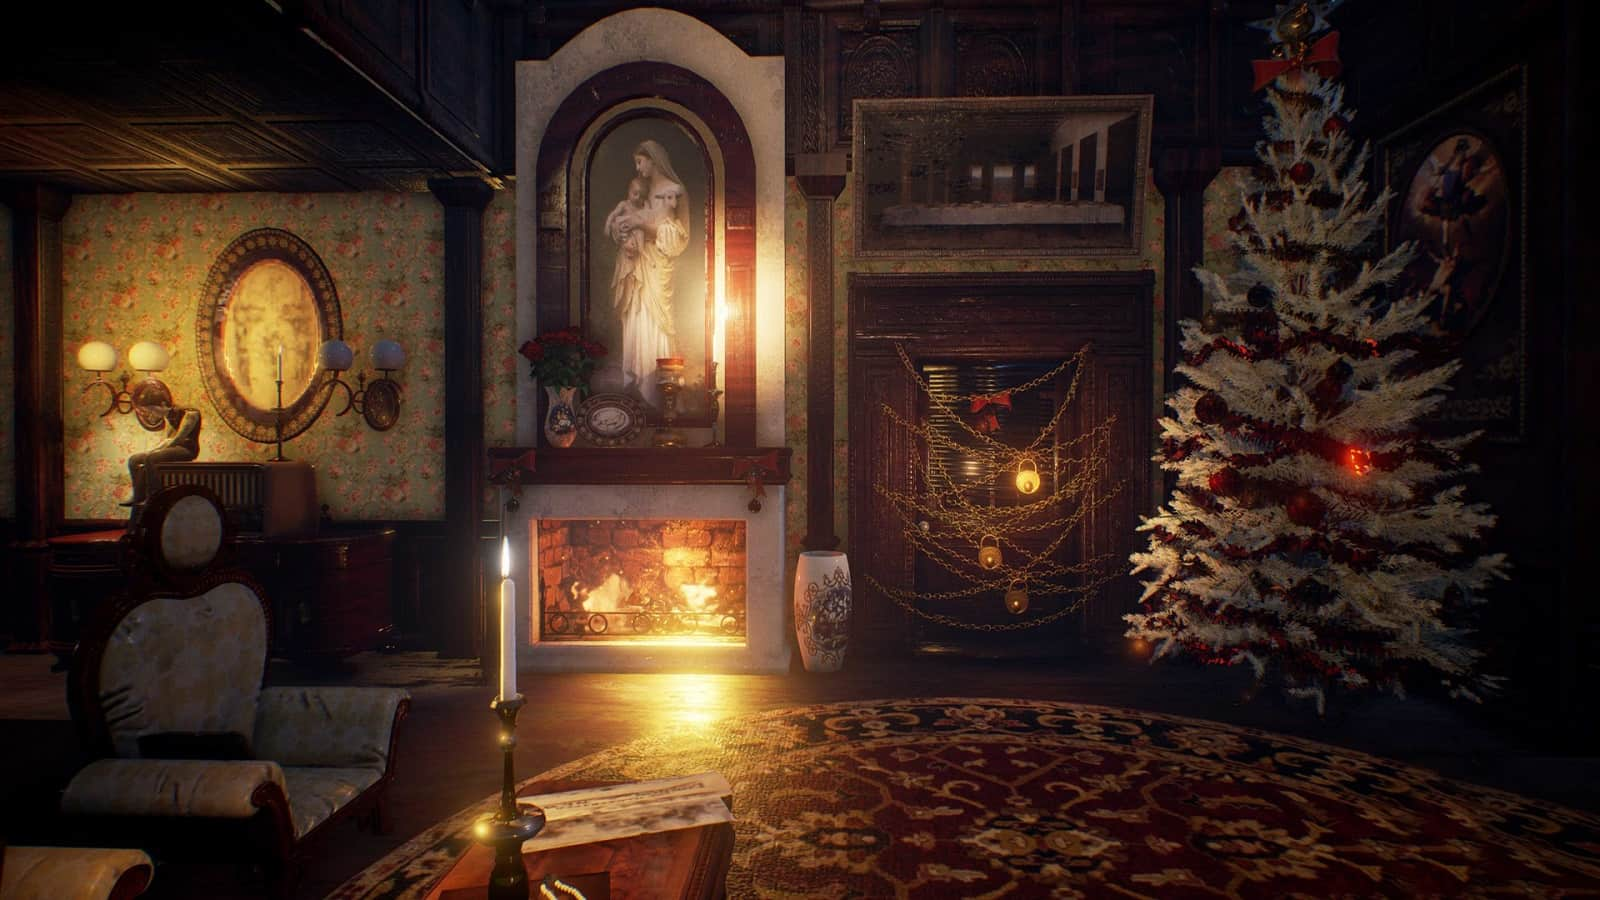 Gray Dawn, Interactive Stone, Horror, Indie Game, Review, Ужасы, Хоррор, Инди-игра, Рецензия, Обзор, Отзыв, Мнение